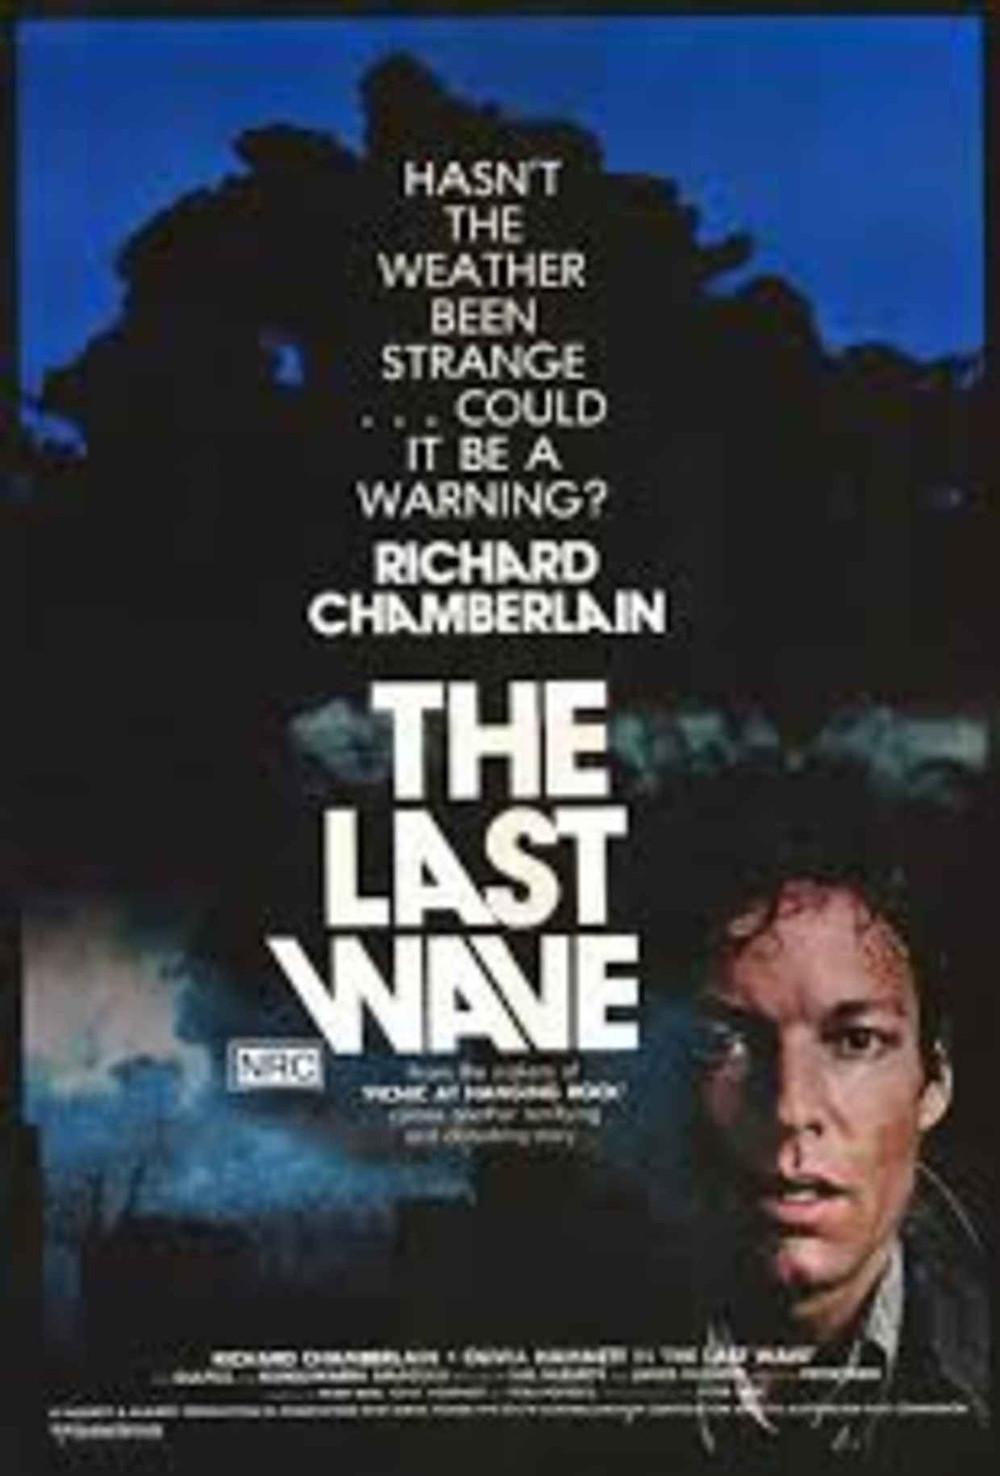 The Last Wave.jpg